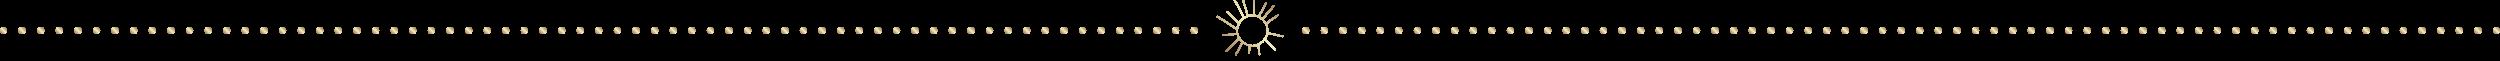 divider-sun-1.png